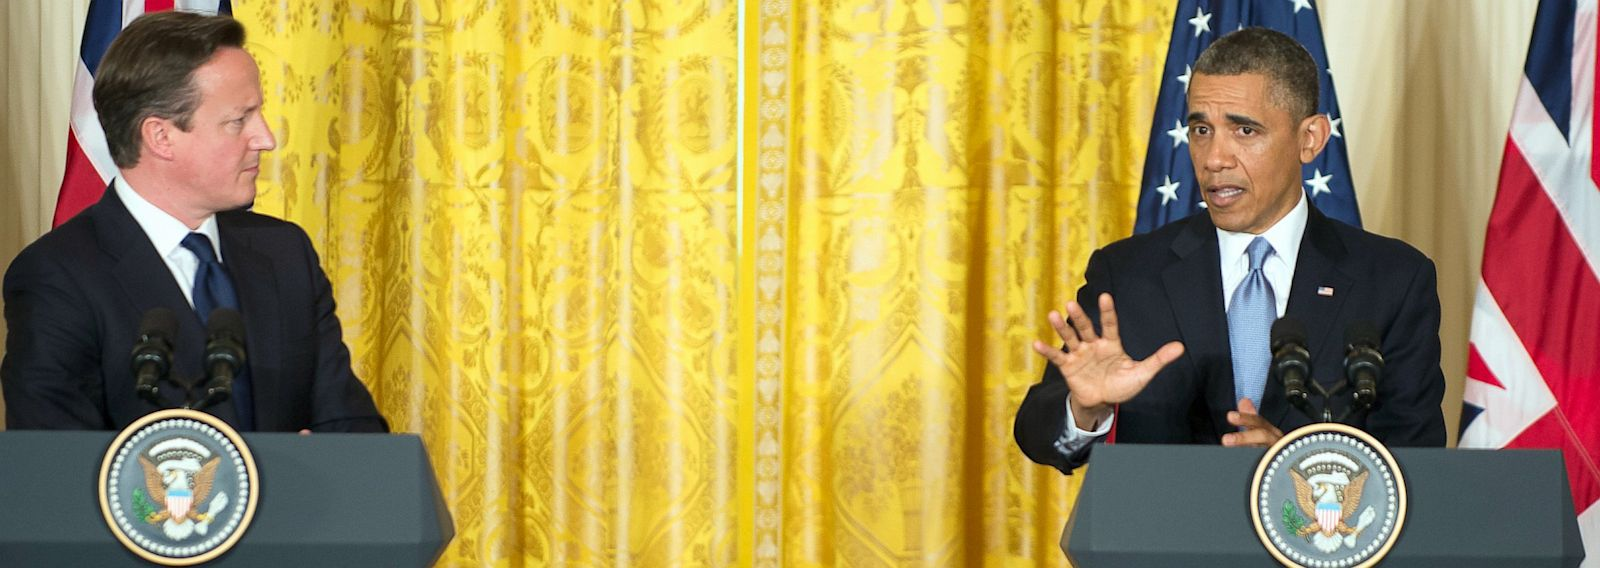 PHOTO: President Barack Obama and British Prime Minister David Cameron